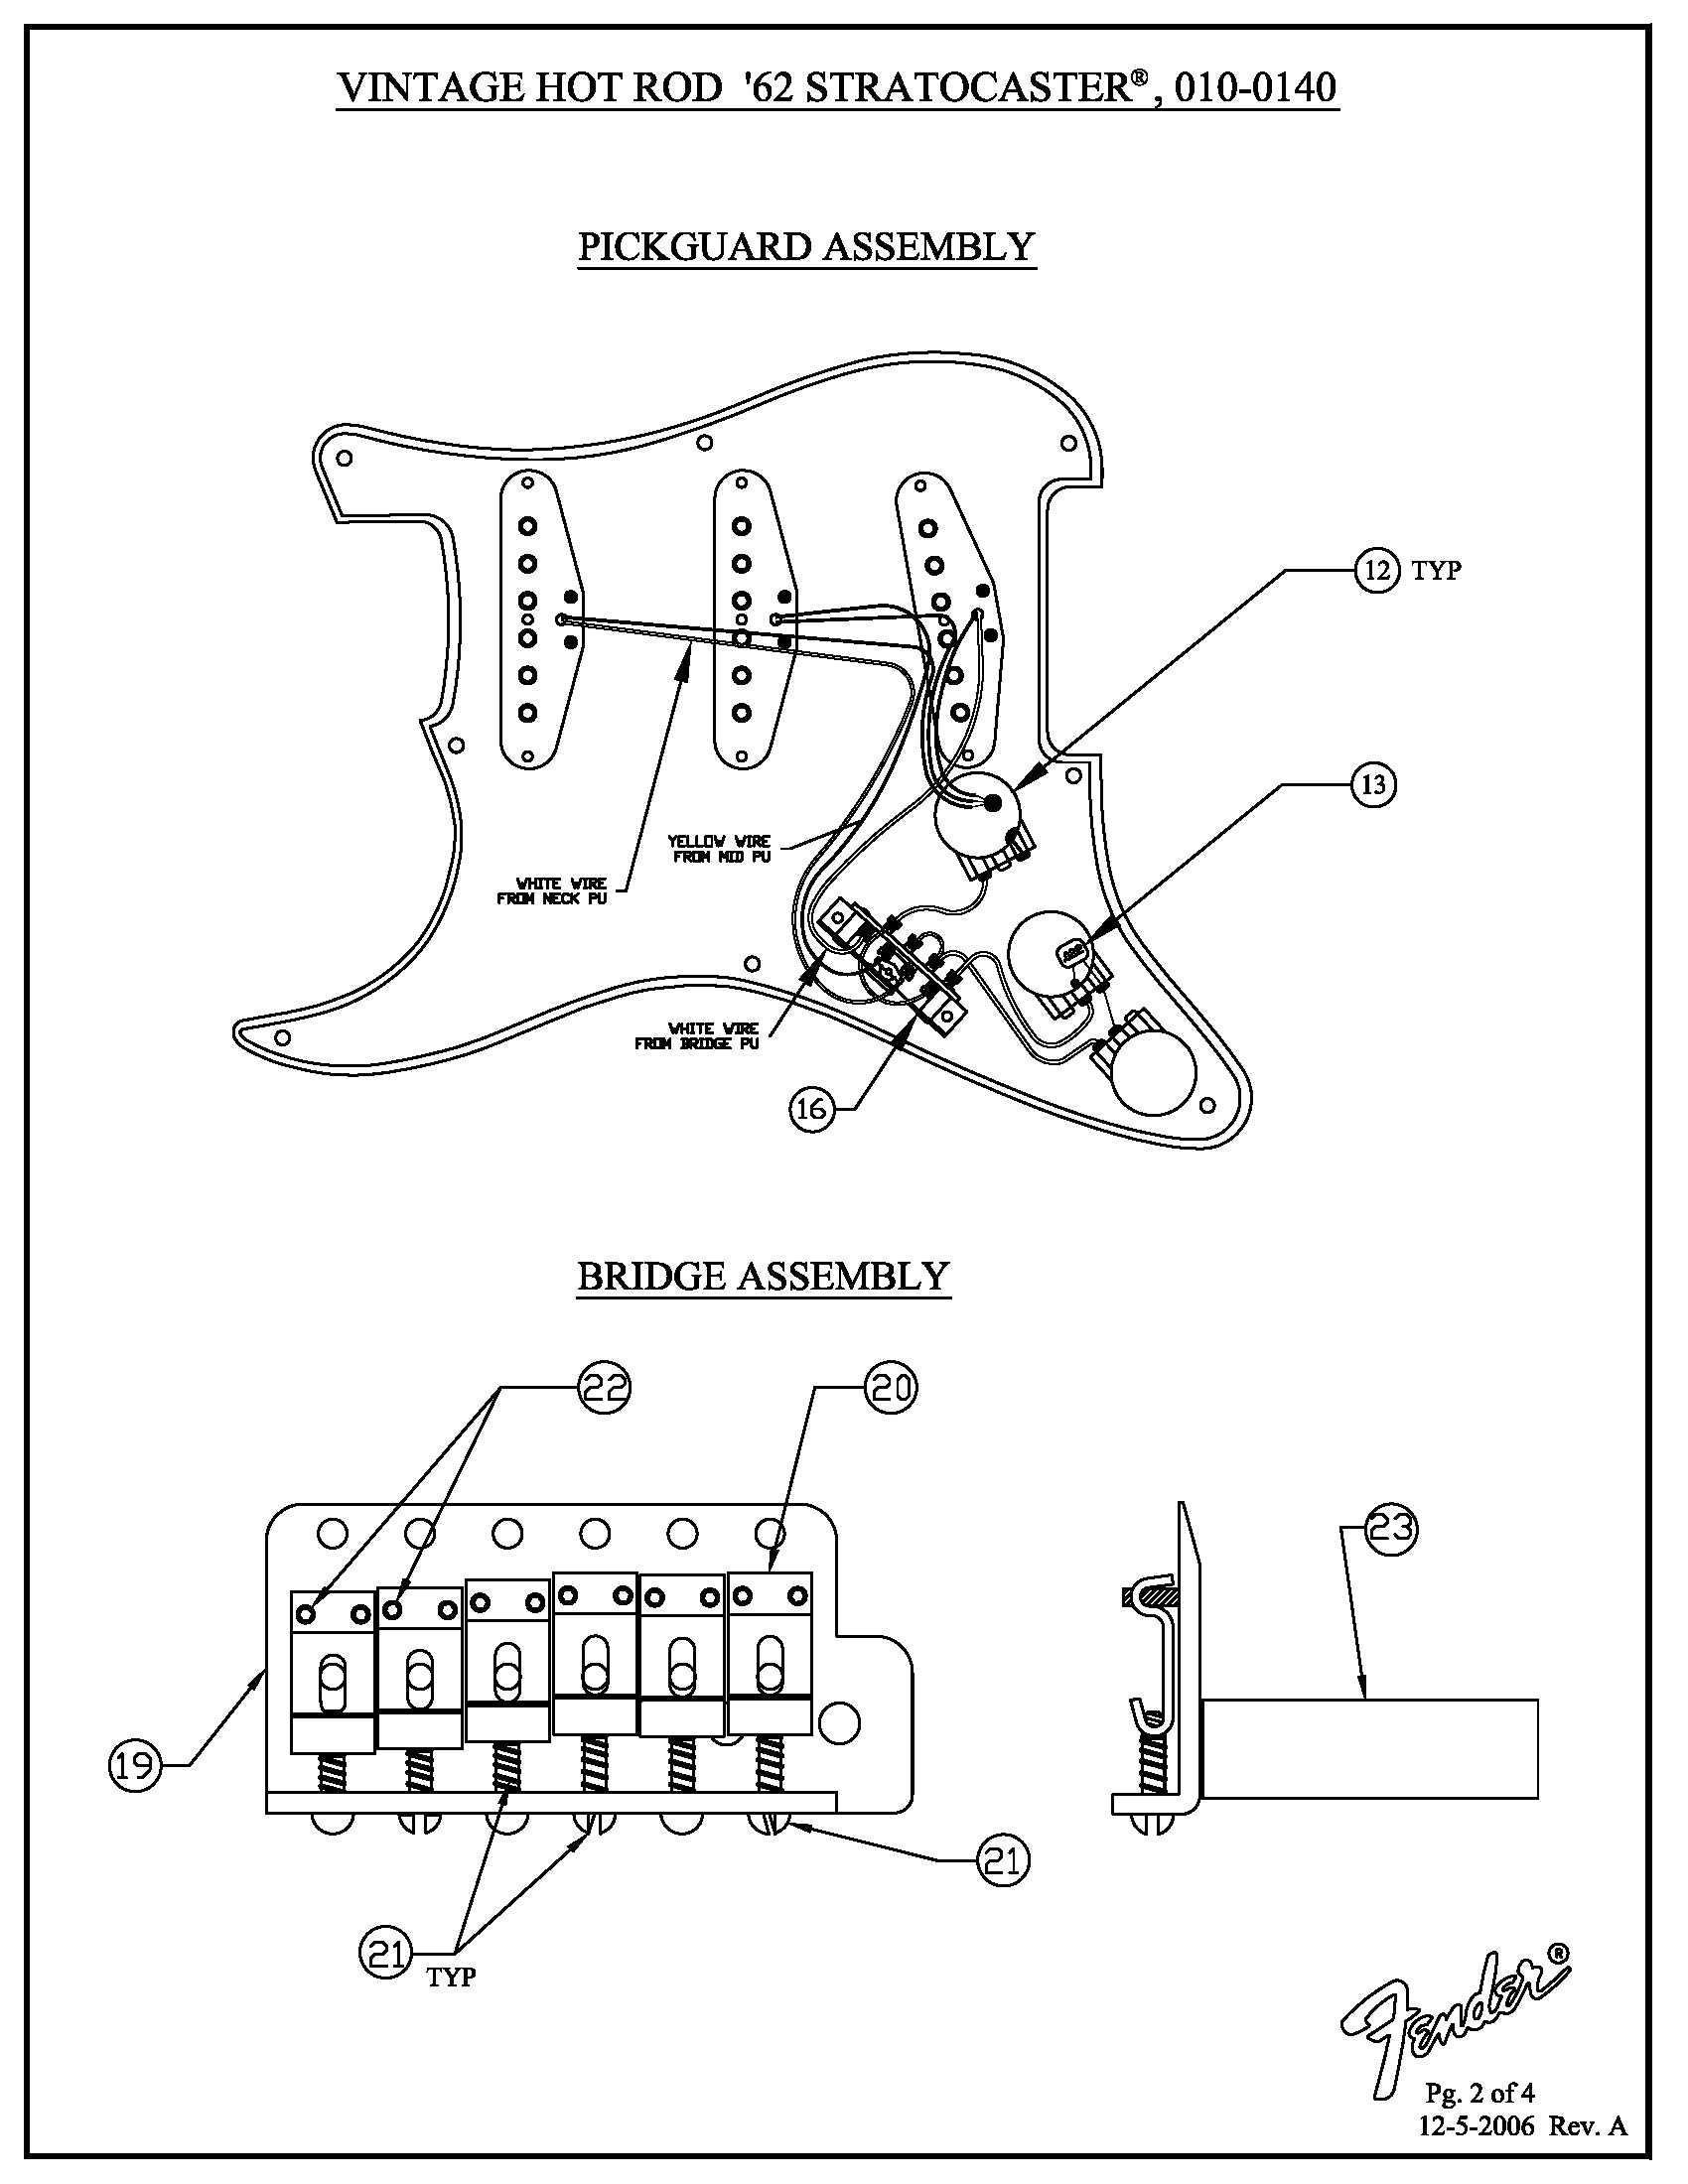 Vintage Hot Rod 62 Strat Wiring Diagram 010014 · Customer